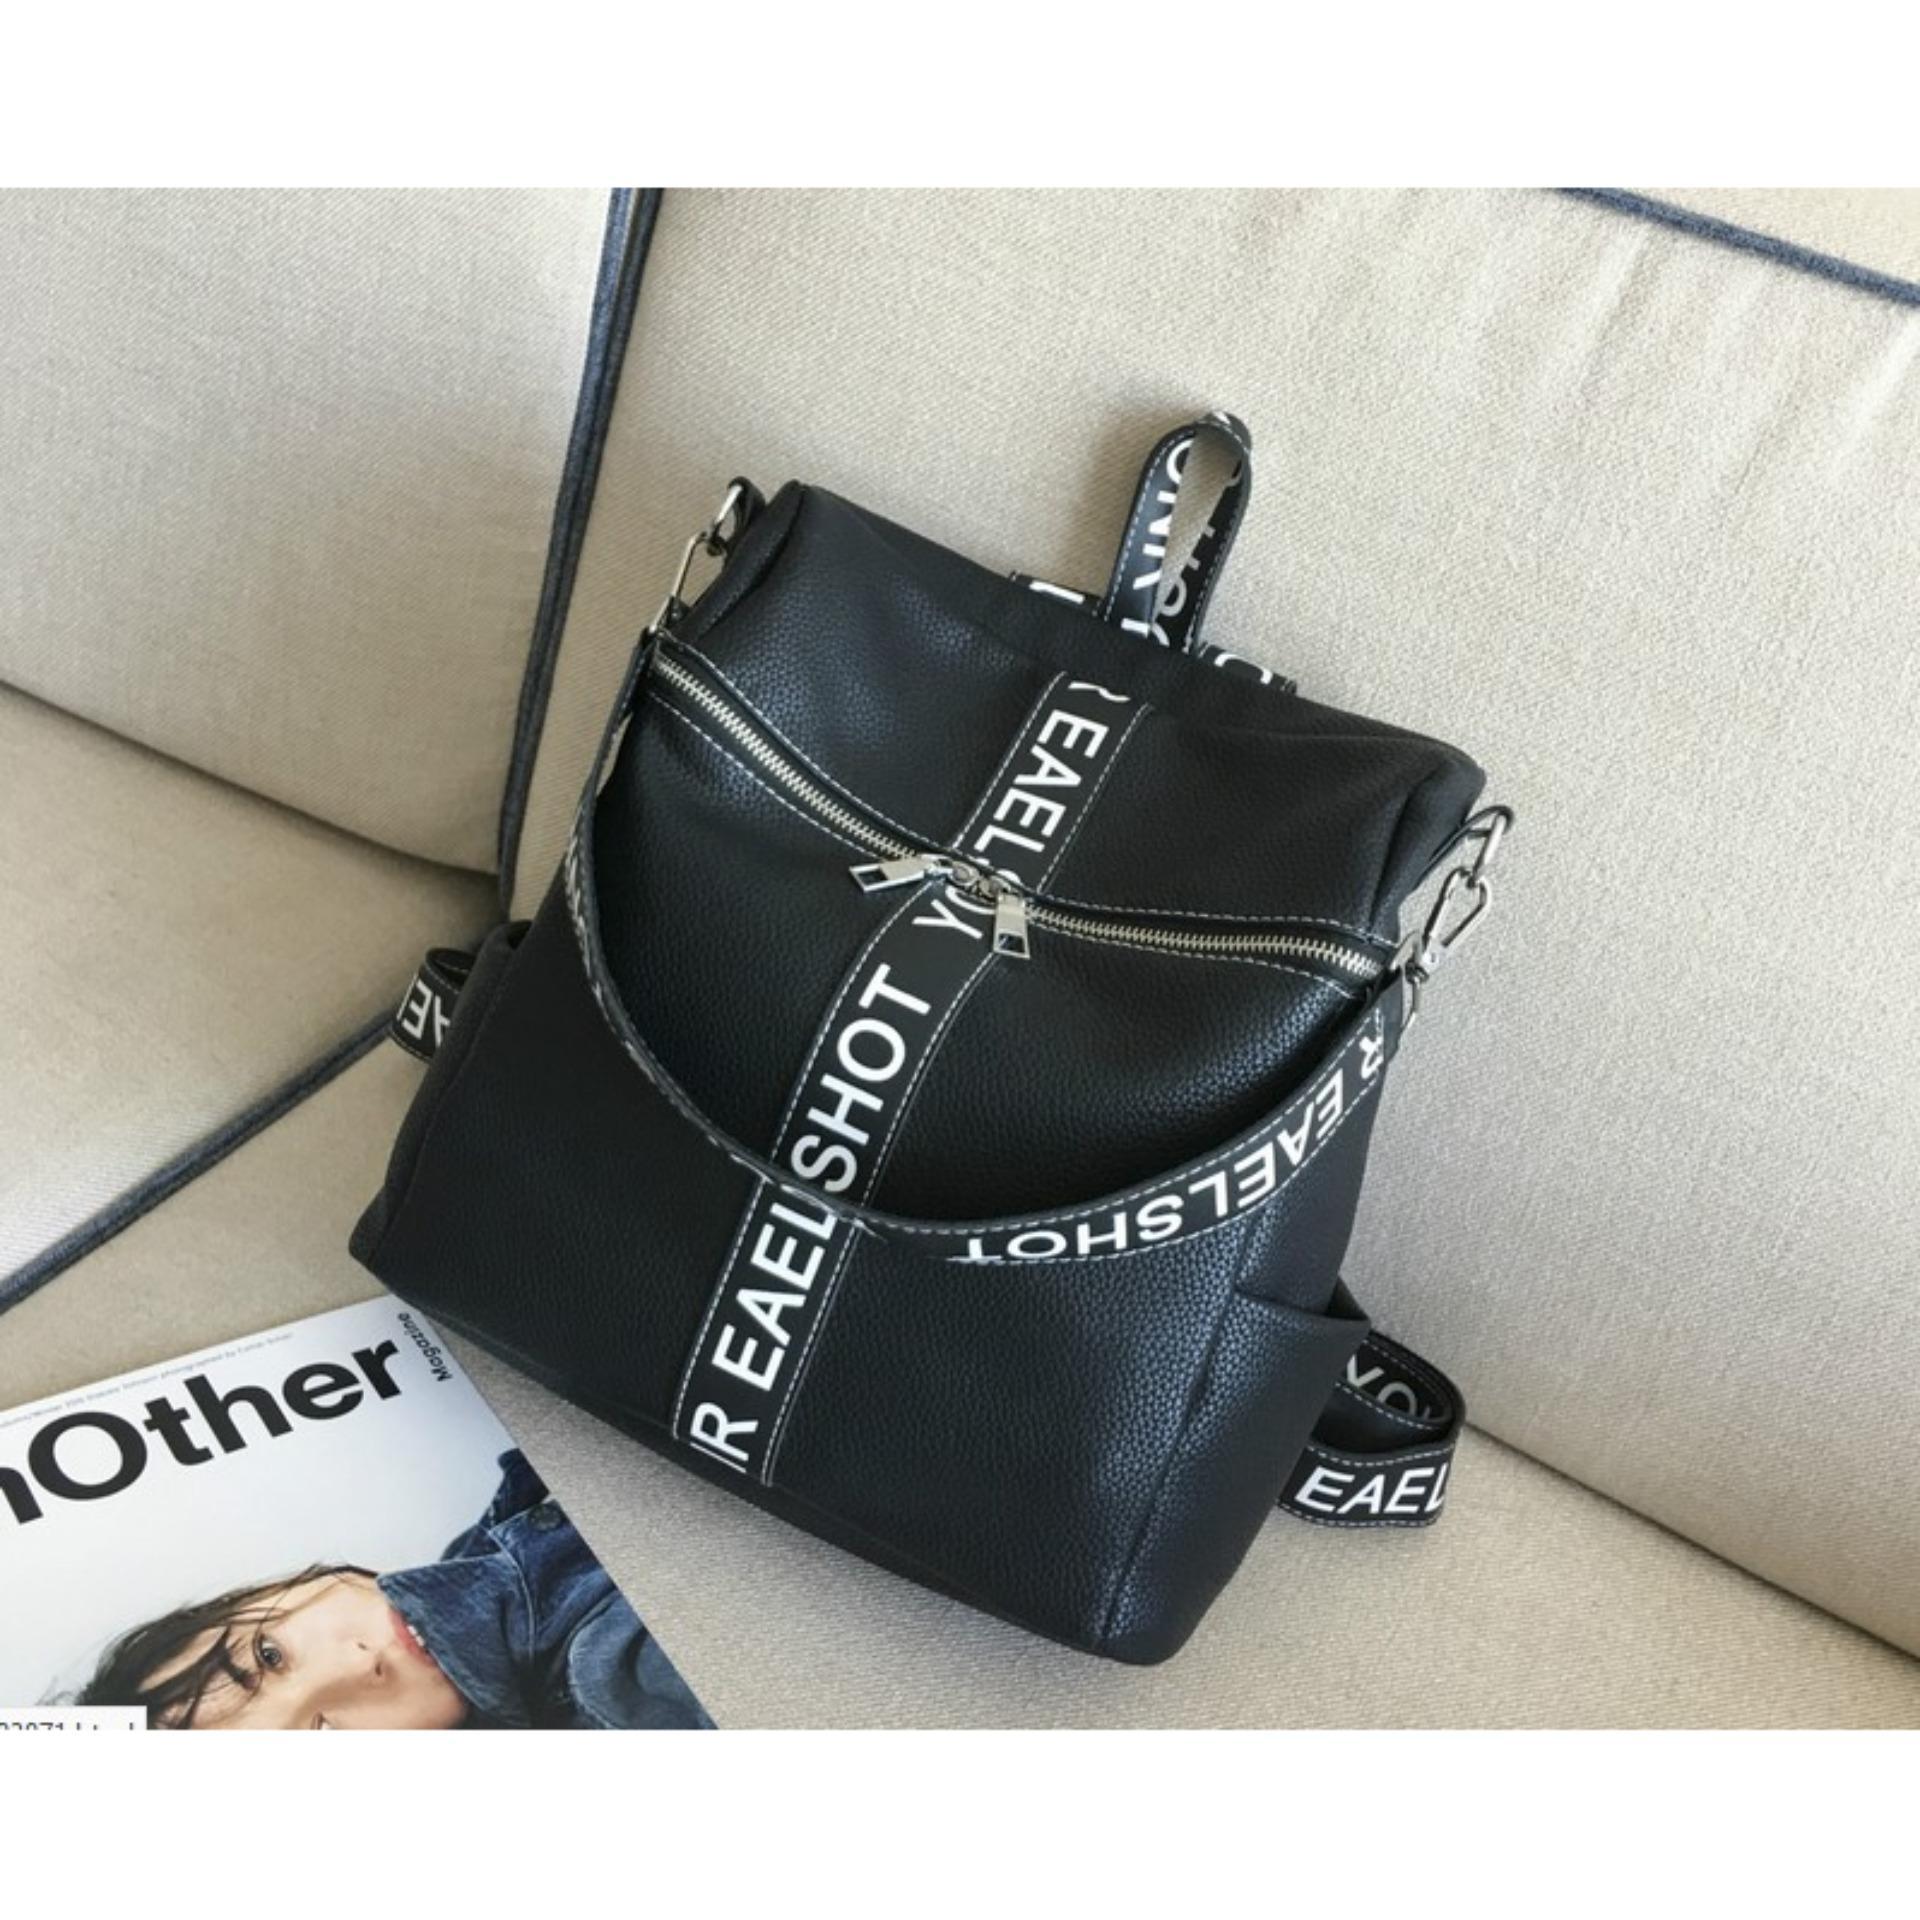 Genevieve 90053 Blue Cute Bagpack With Teddybear Tas Ransel8 90098 Ransel Backpack Wanita Import Murah Terbaru Cp 139 Black